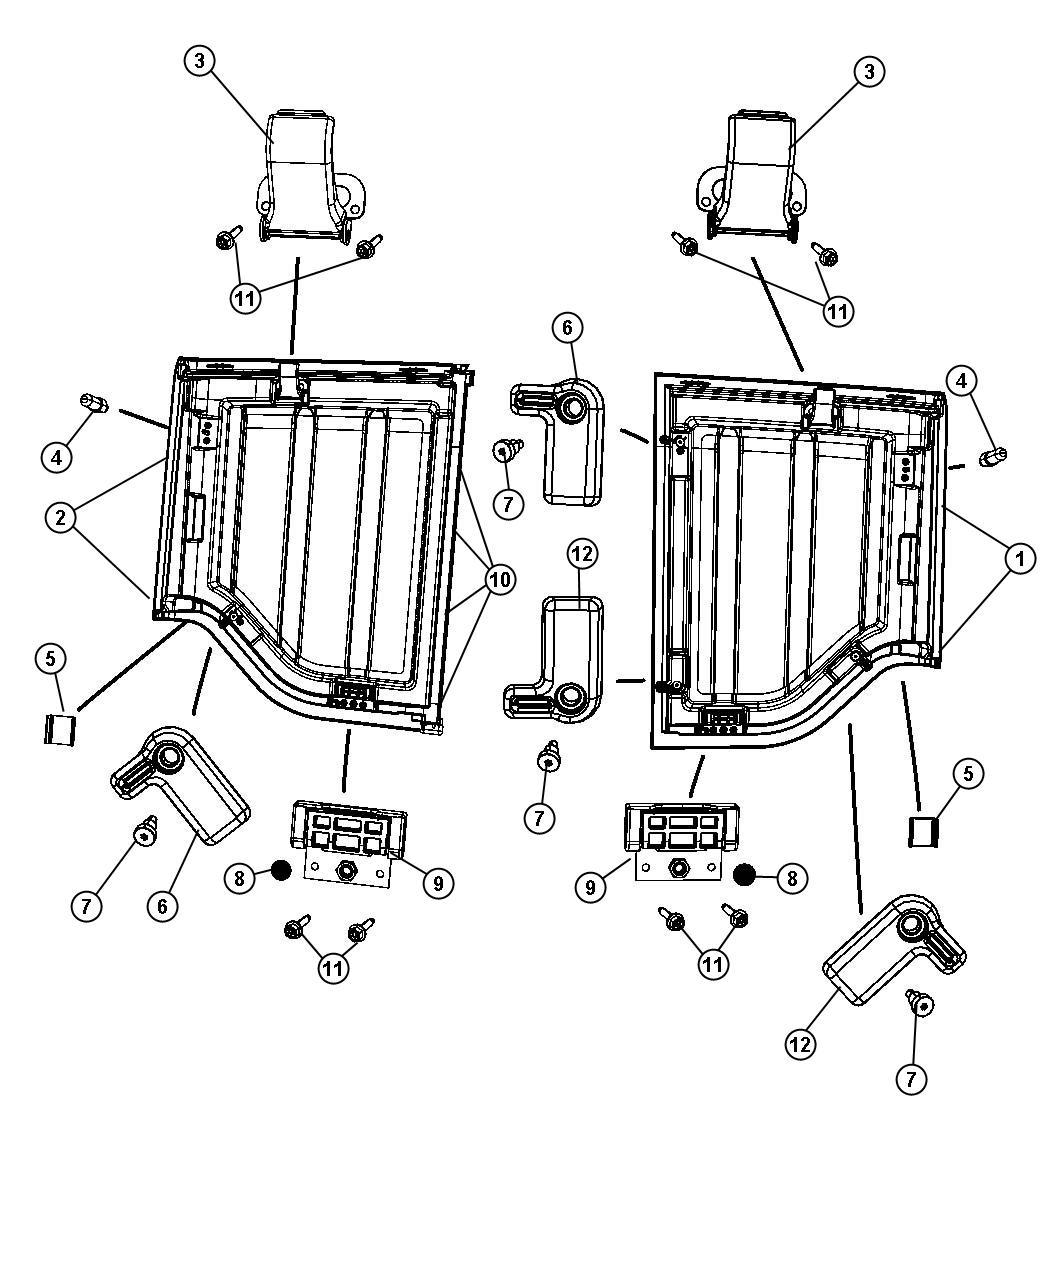 Jeep Wrangler Targa Top Panels And Hardware Vko